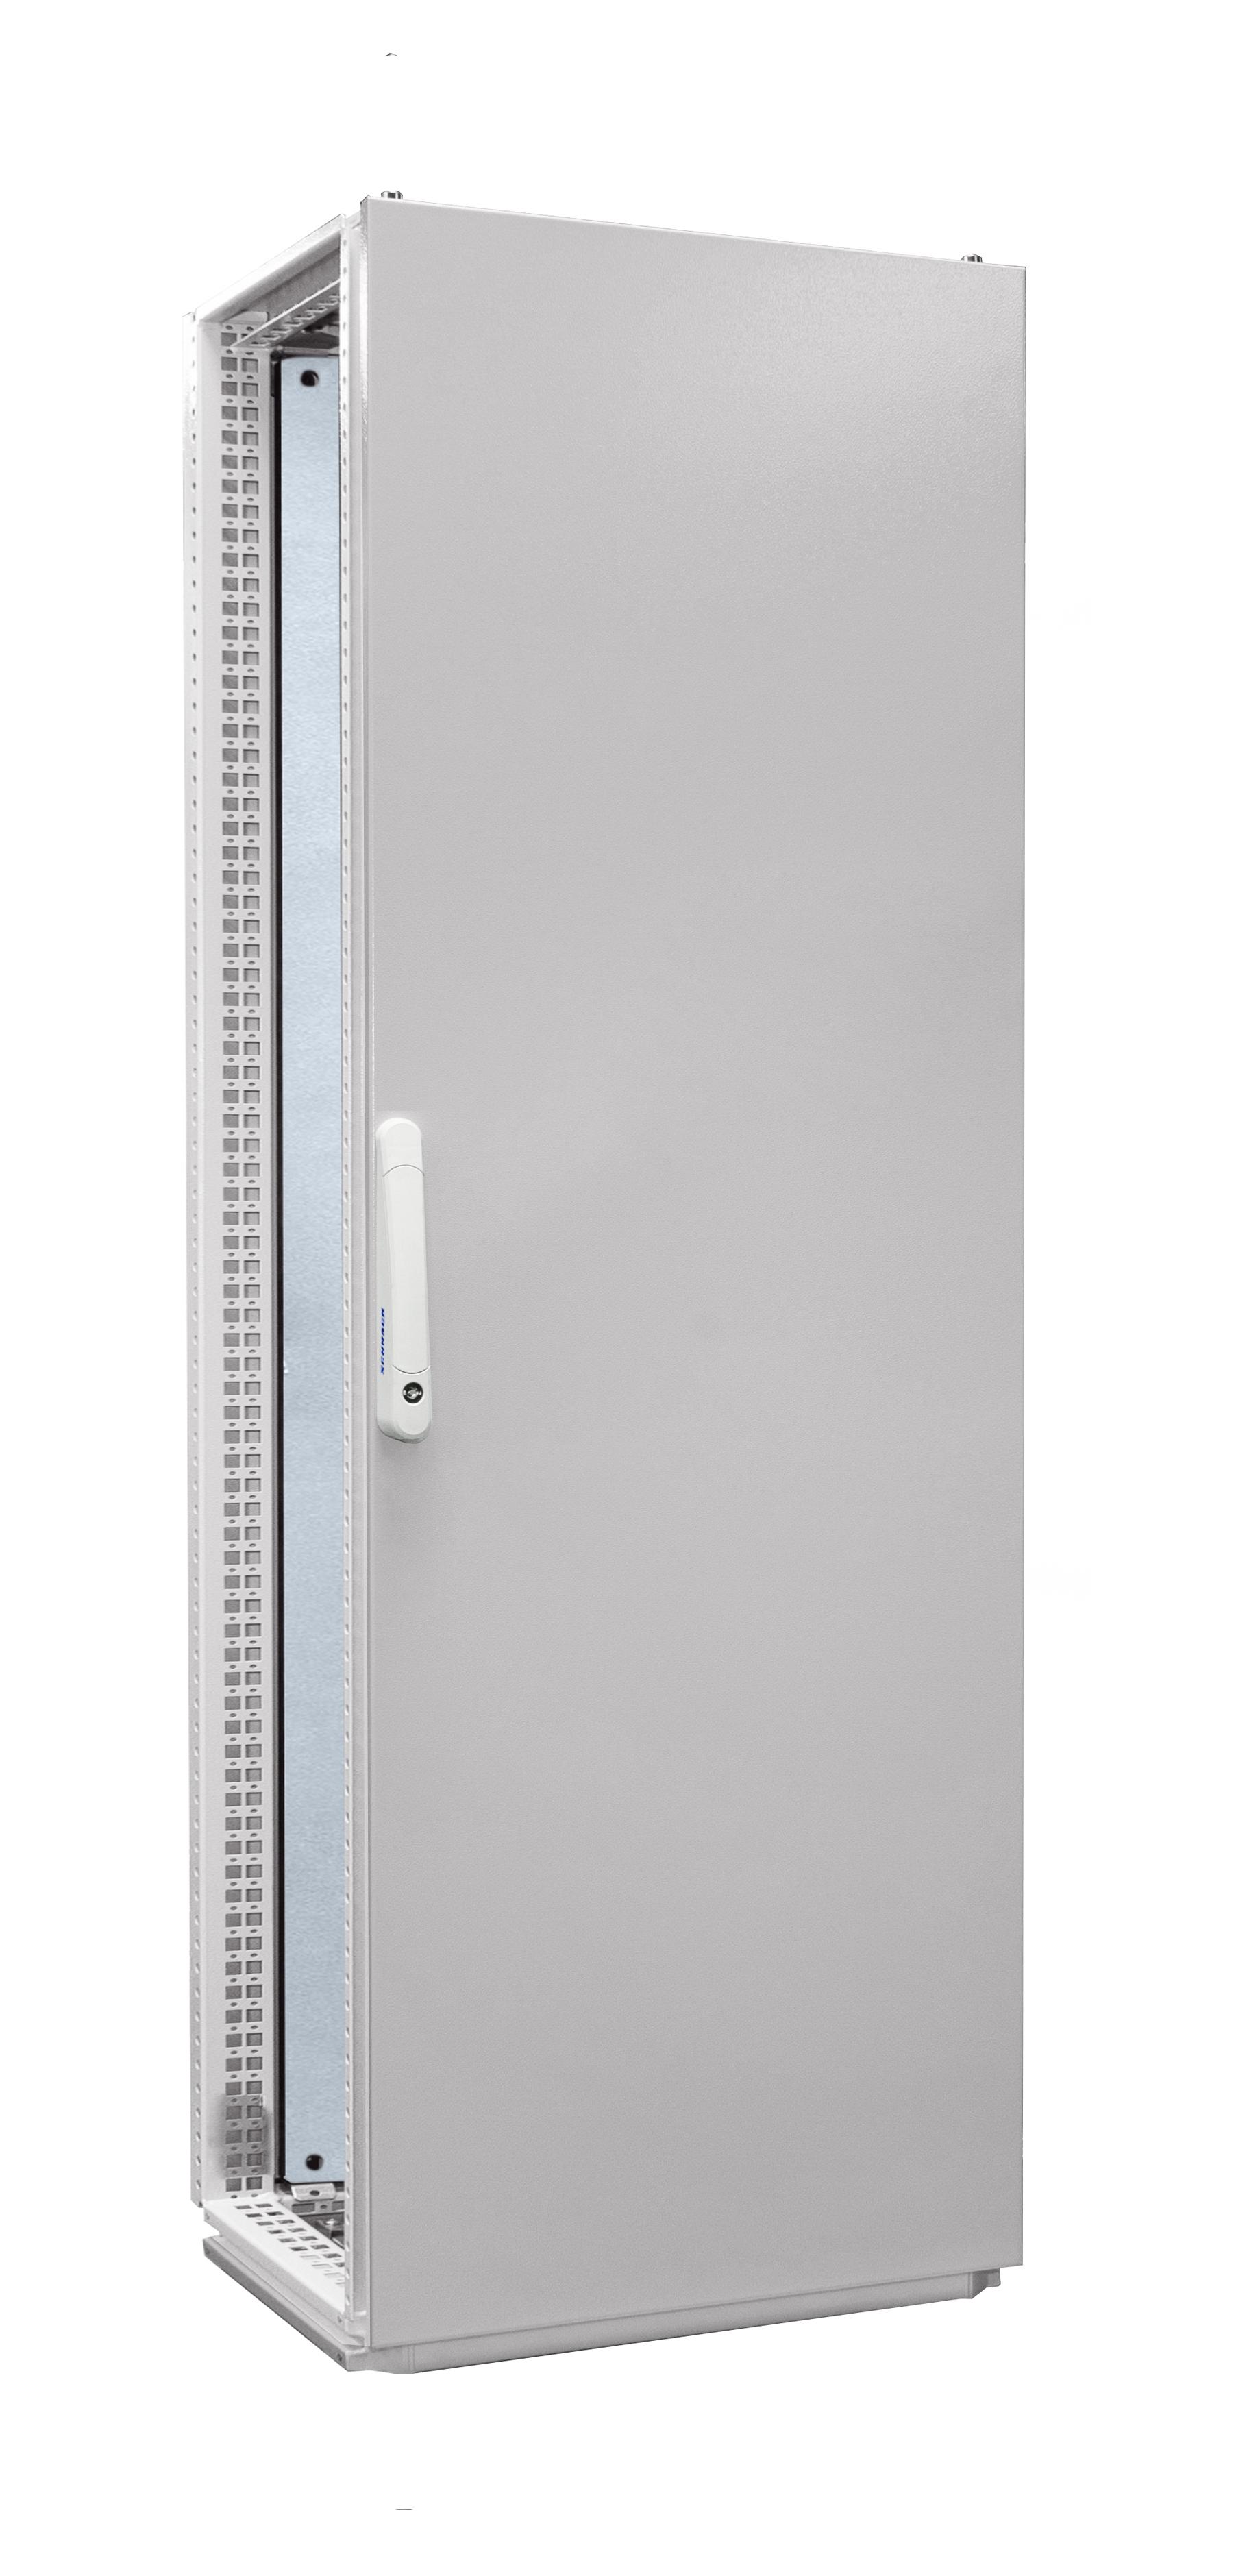 1 Stk Anreihschrank 1-Tür IP55 H=1800 B=600 T=600mm Stahlblech AC186060--